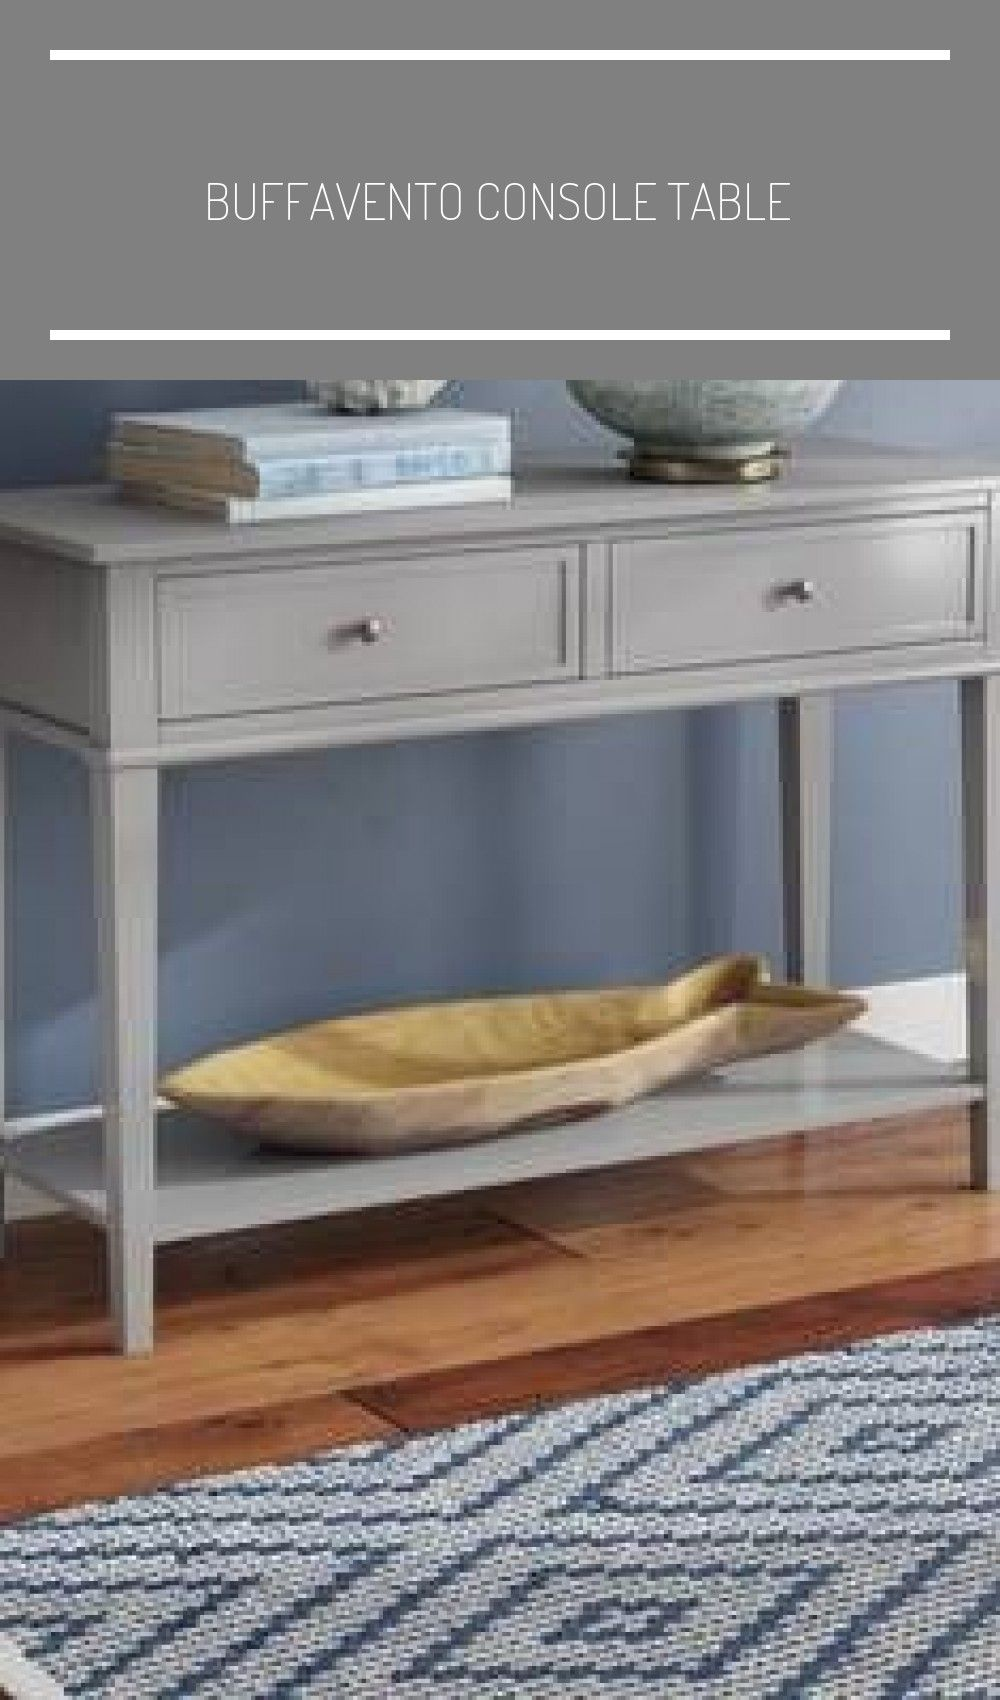 Photo of Beachcrest Home Buffavento Console Table & Reviews | Wayfair #ein